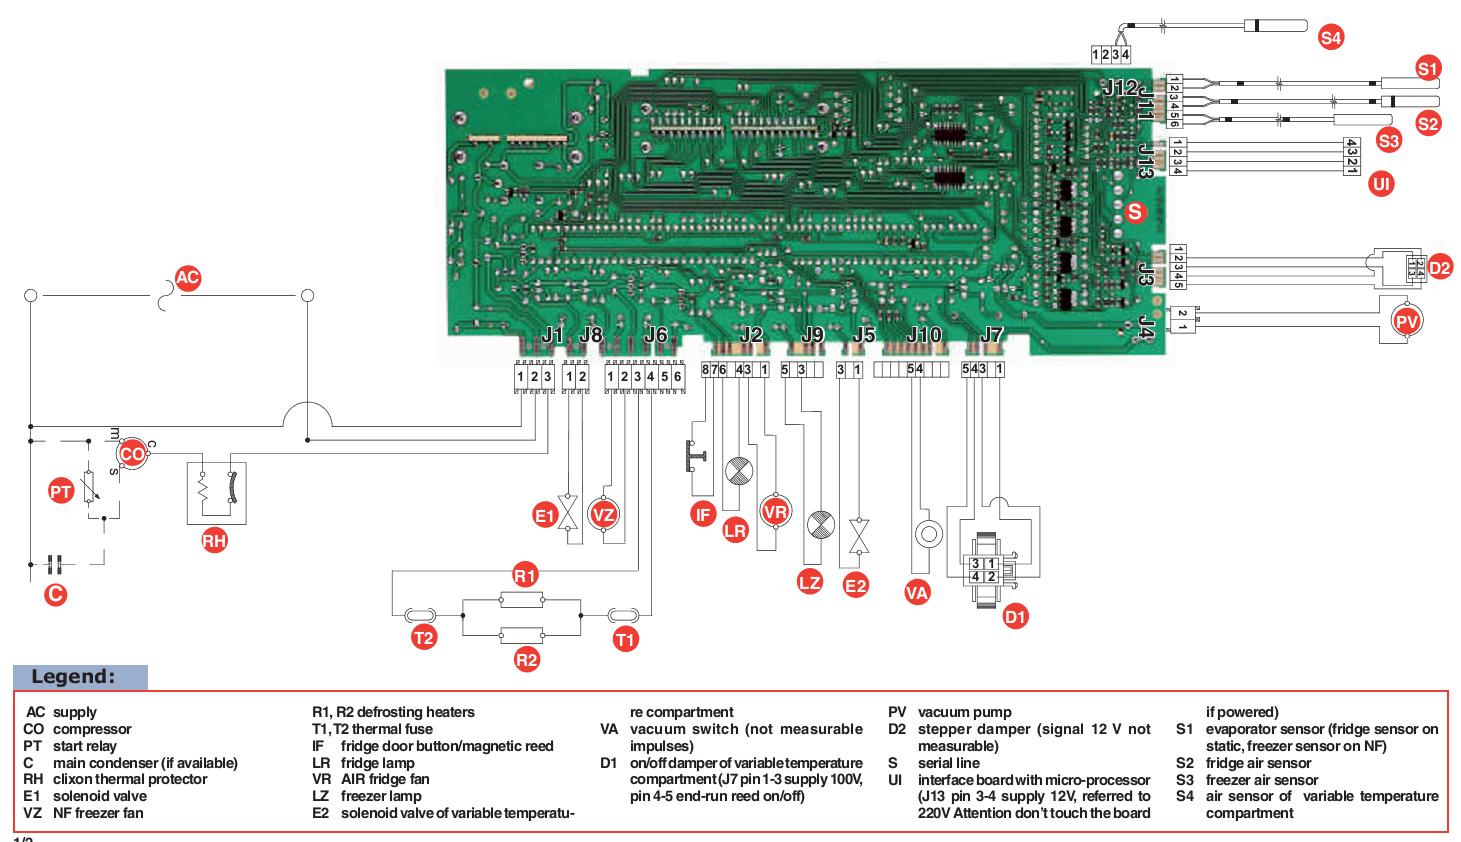 I Have An Ariston Frost Free Fridge Model Mbt 1902 Fit 220v Fridge Models Vacuum Switch Vacuum Pump